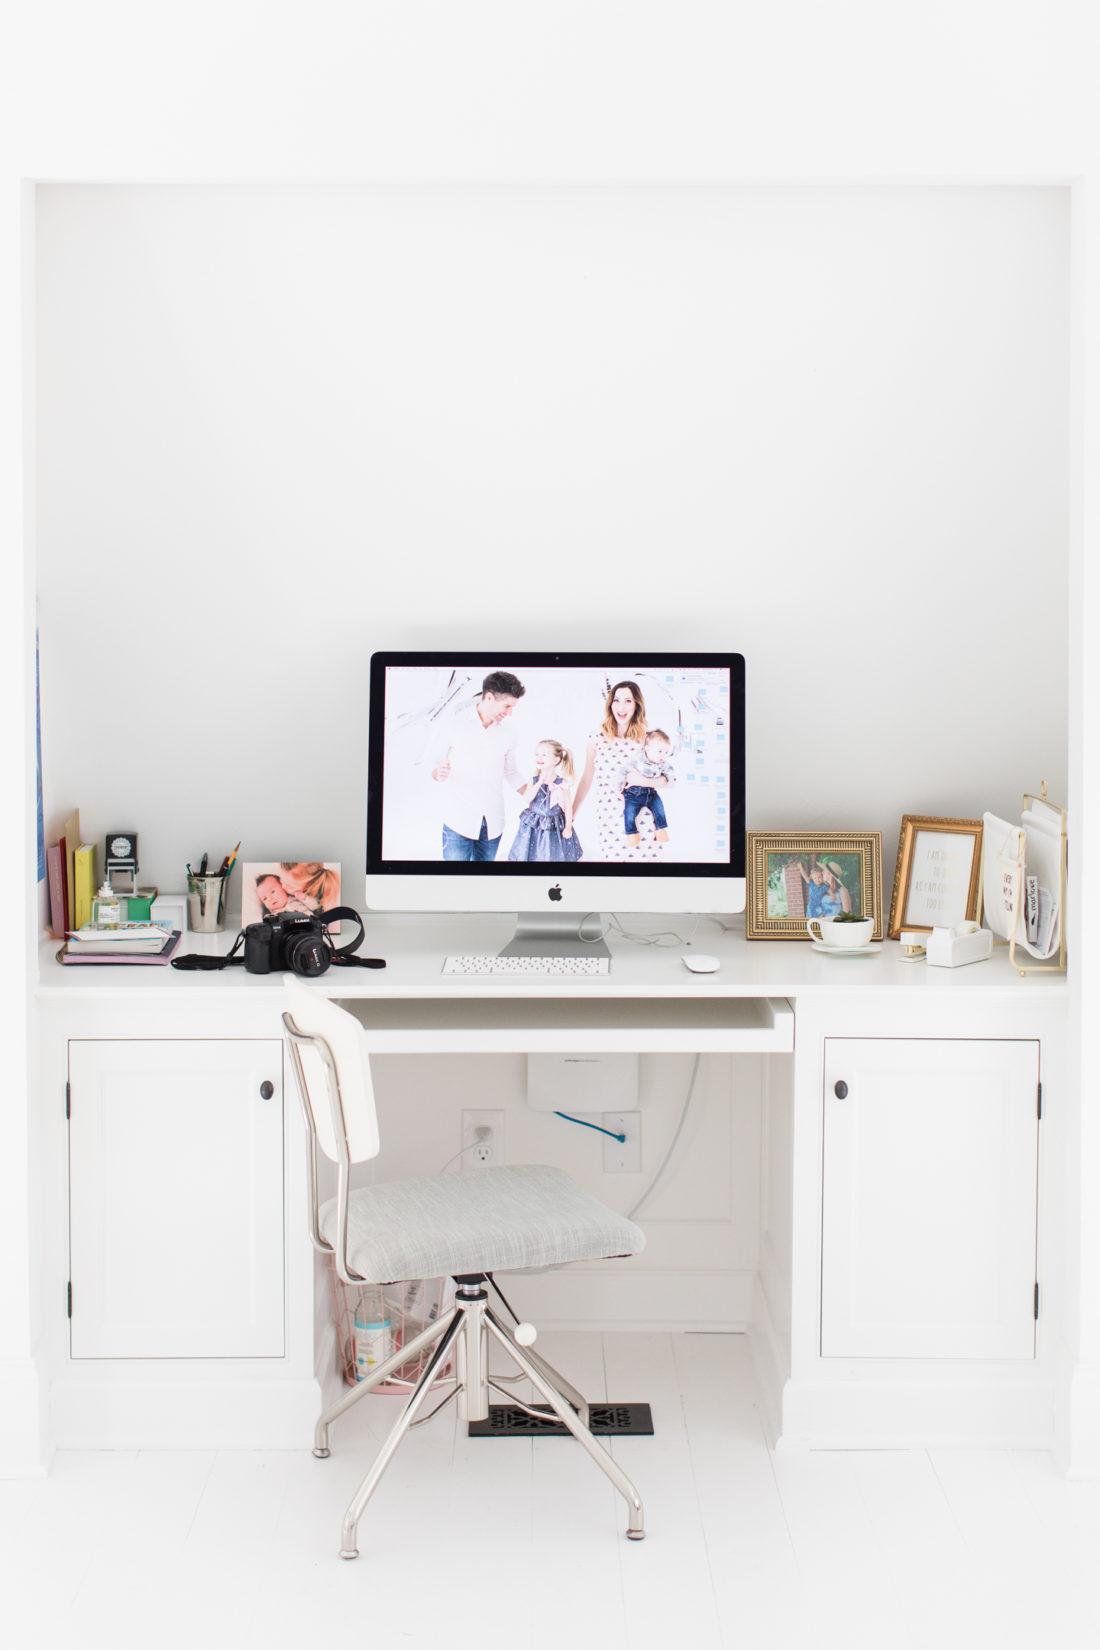 Eva Amurri Martino's desk in the Happily Eva After studio